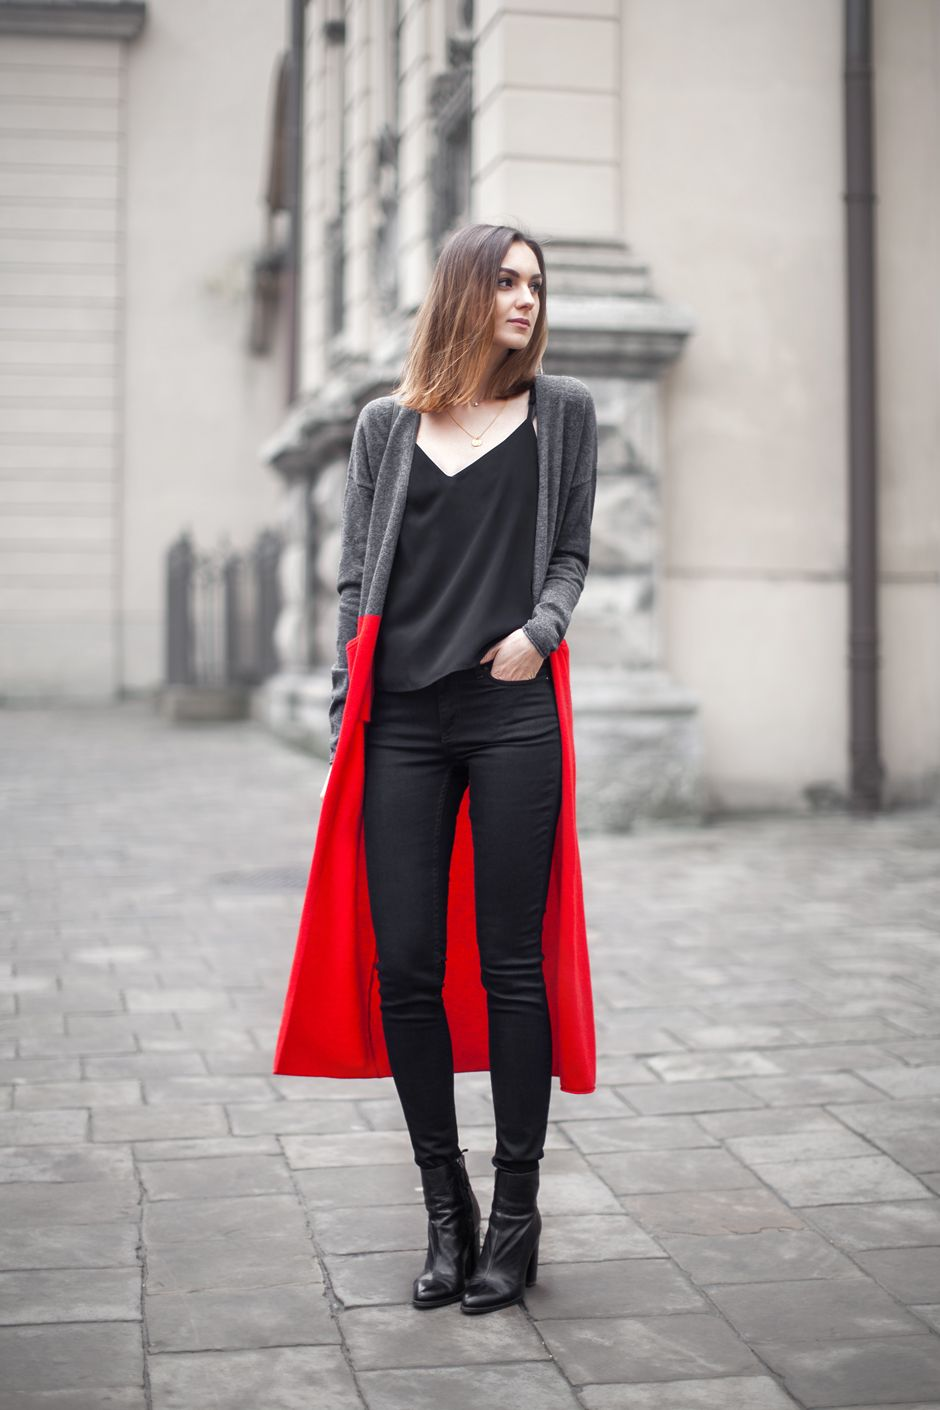 c1feda1f7450 4 WAYS TO WEAR SKINNY JEANS THIS SPRING Fashion Agony waysify ...